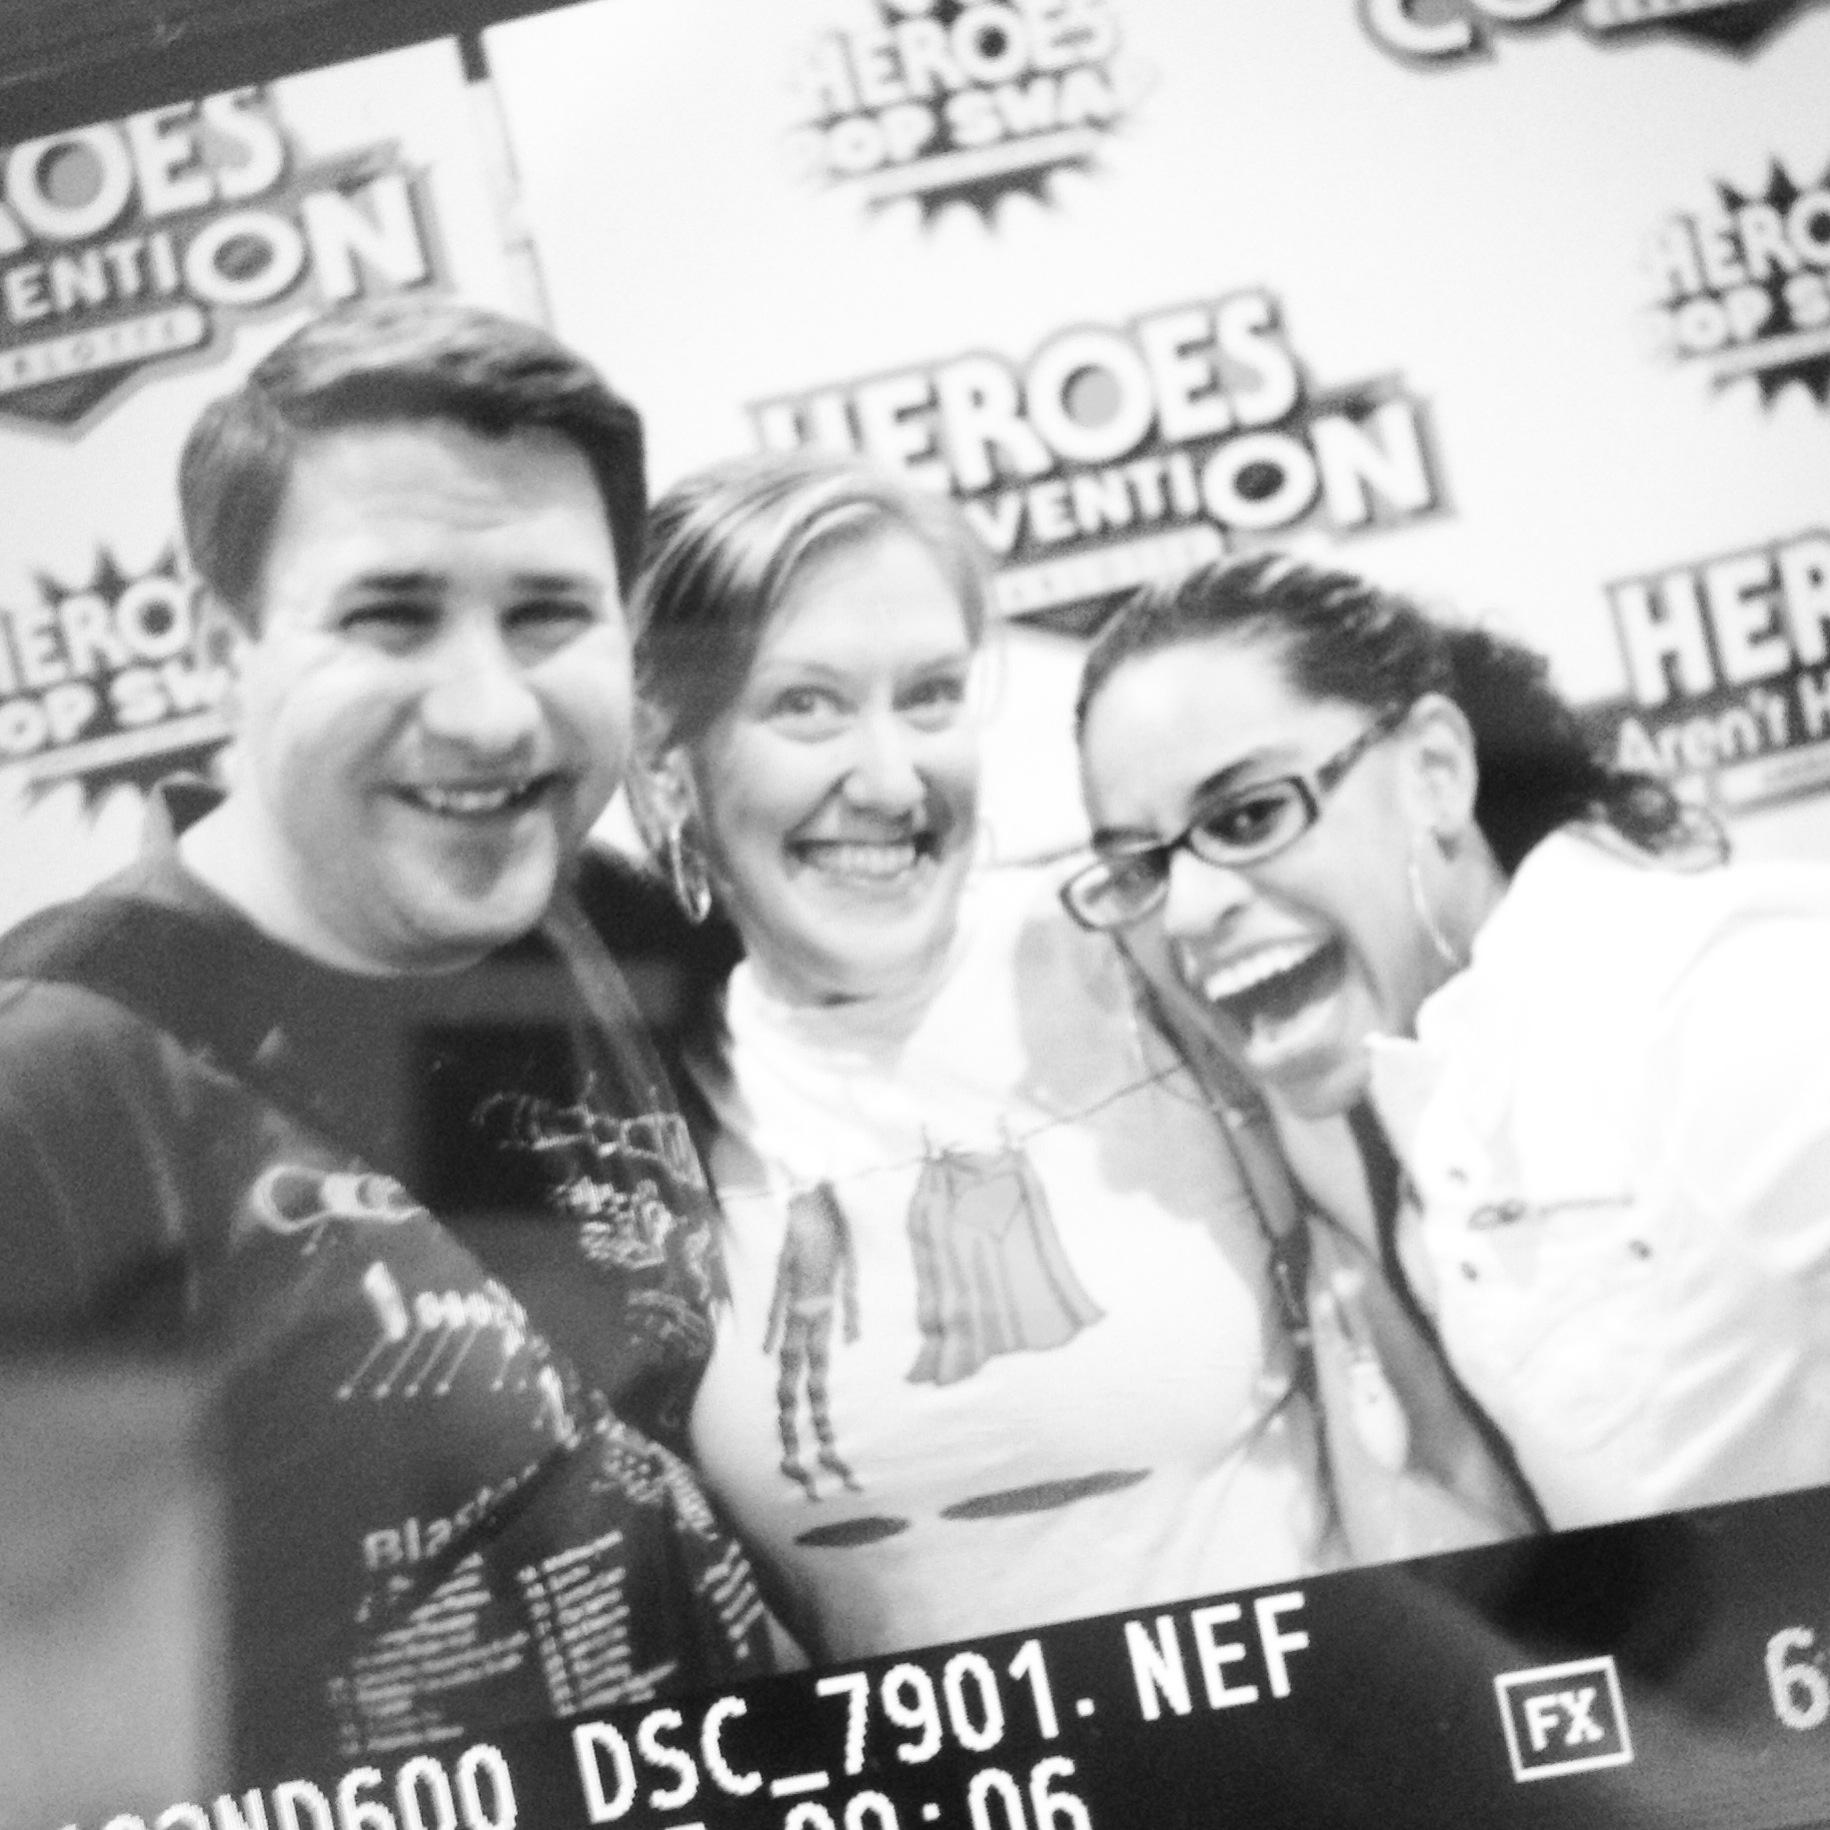 friends-heroes-convention-charlotte-2013.JPG